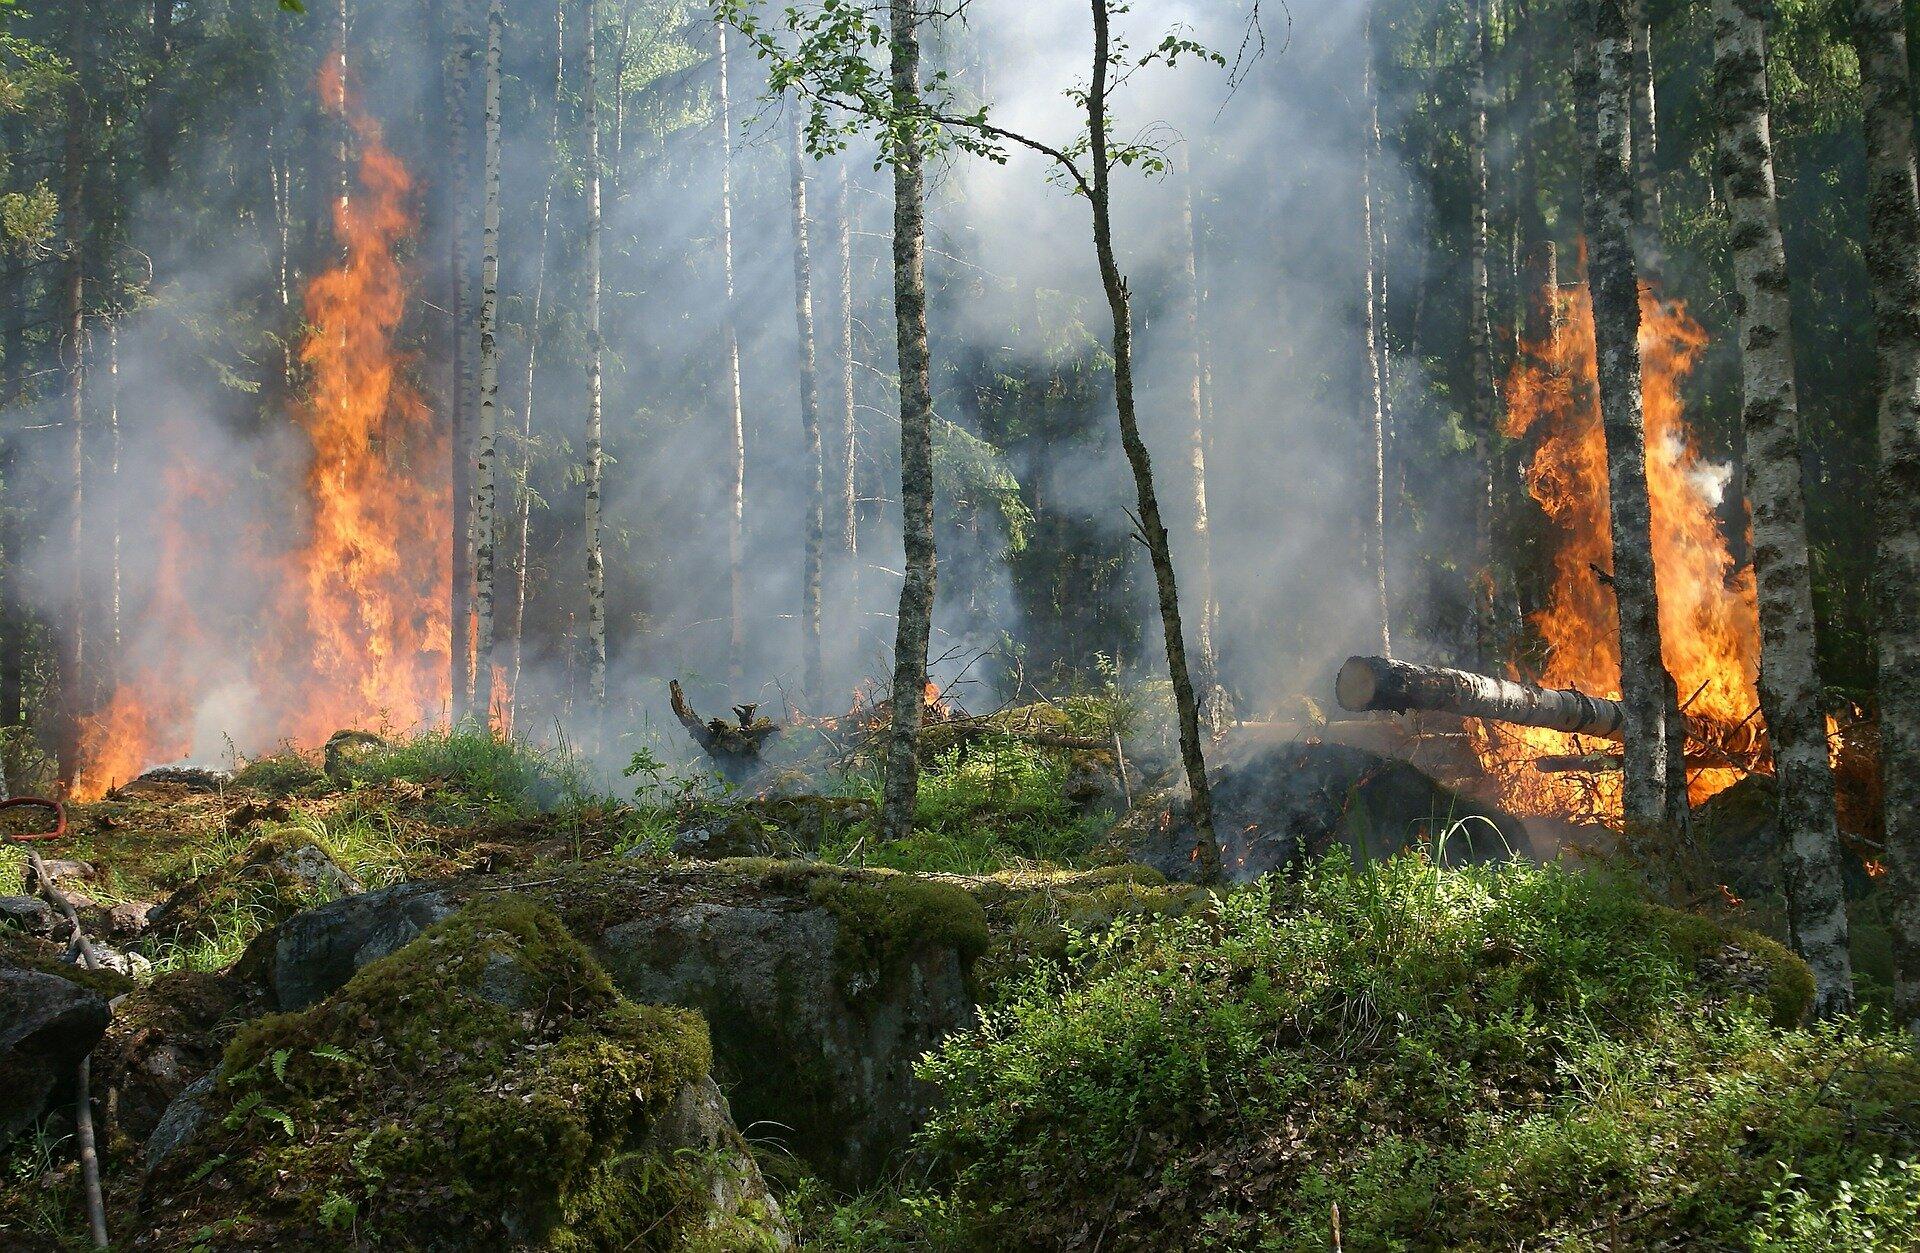 Sustainable Land Management Key to Reducing Amazon Wildfires